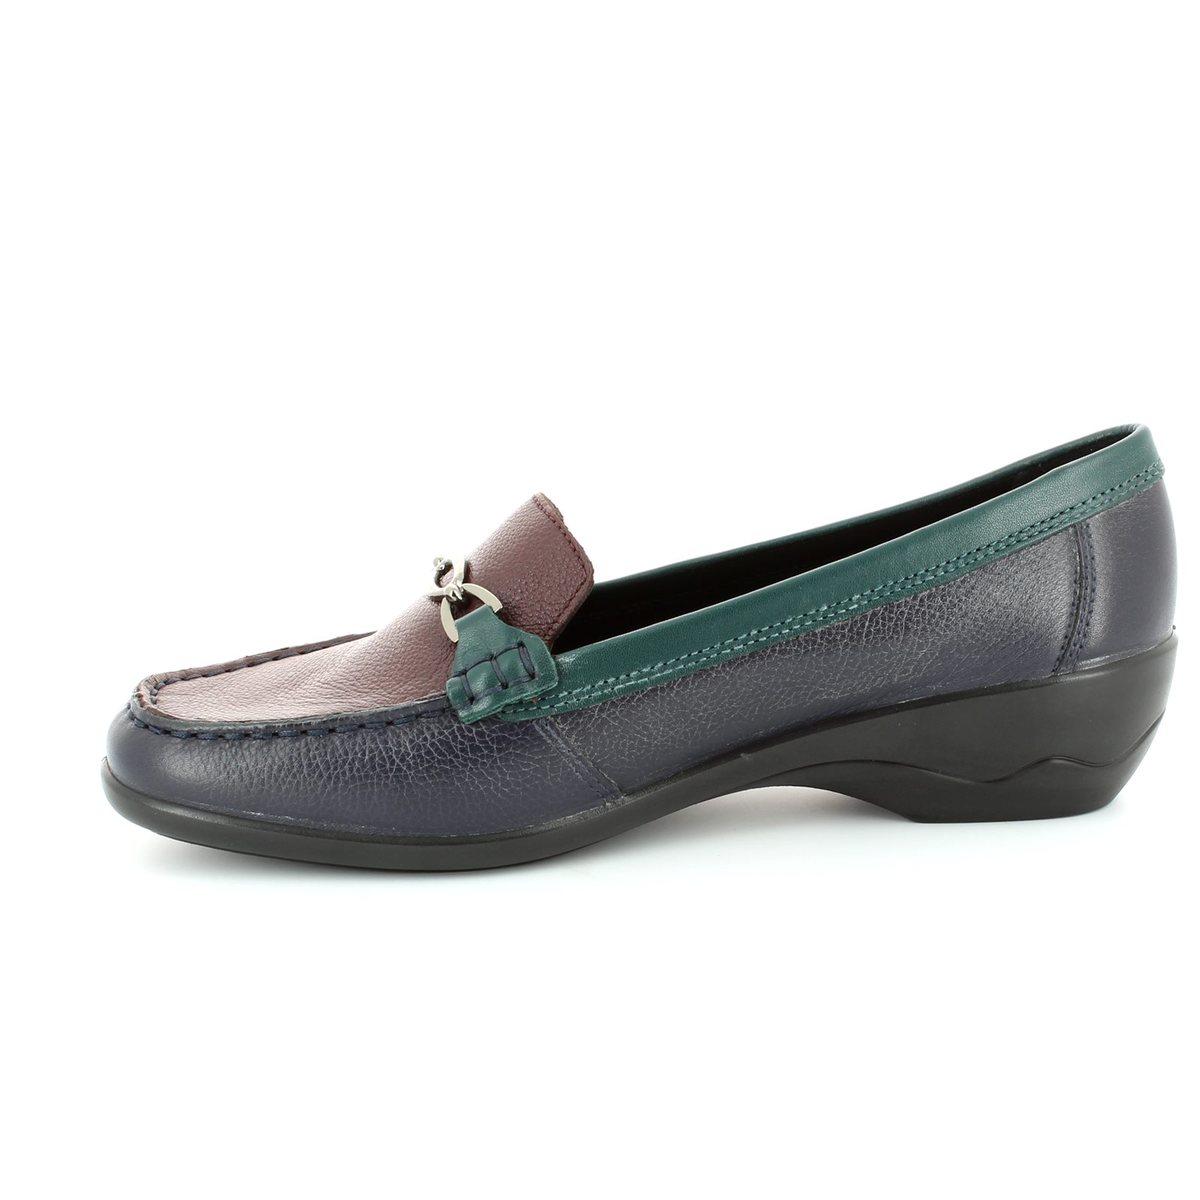 62416d334a1 Padders Ellen 2E Fit 279-27 Navy-Green-wine loafers